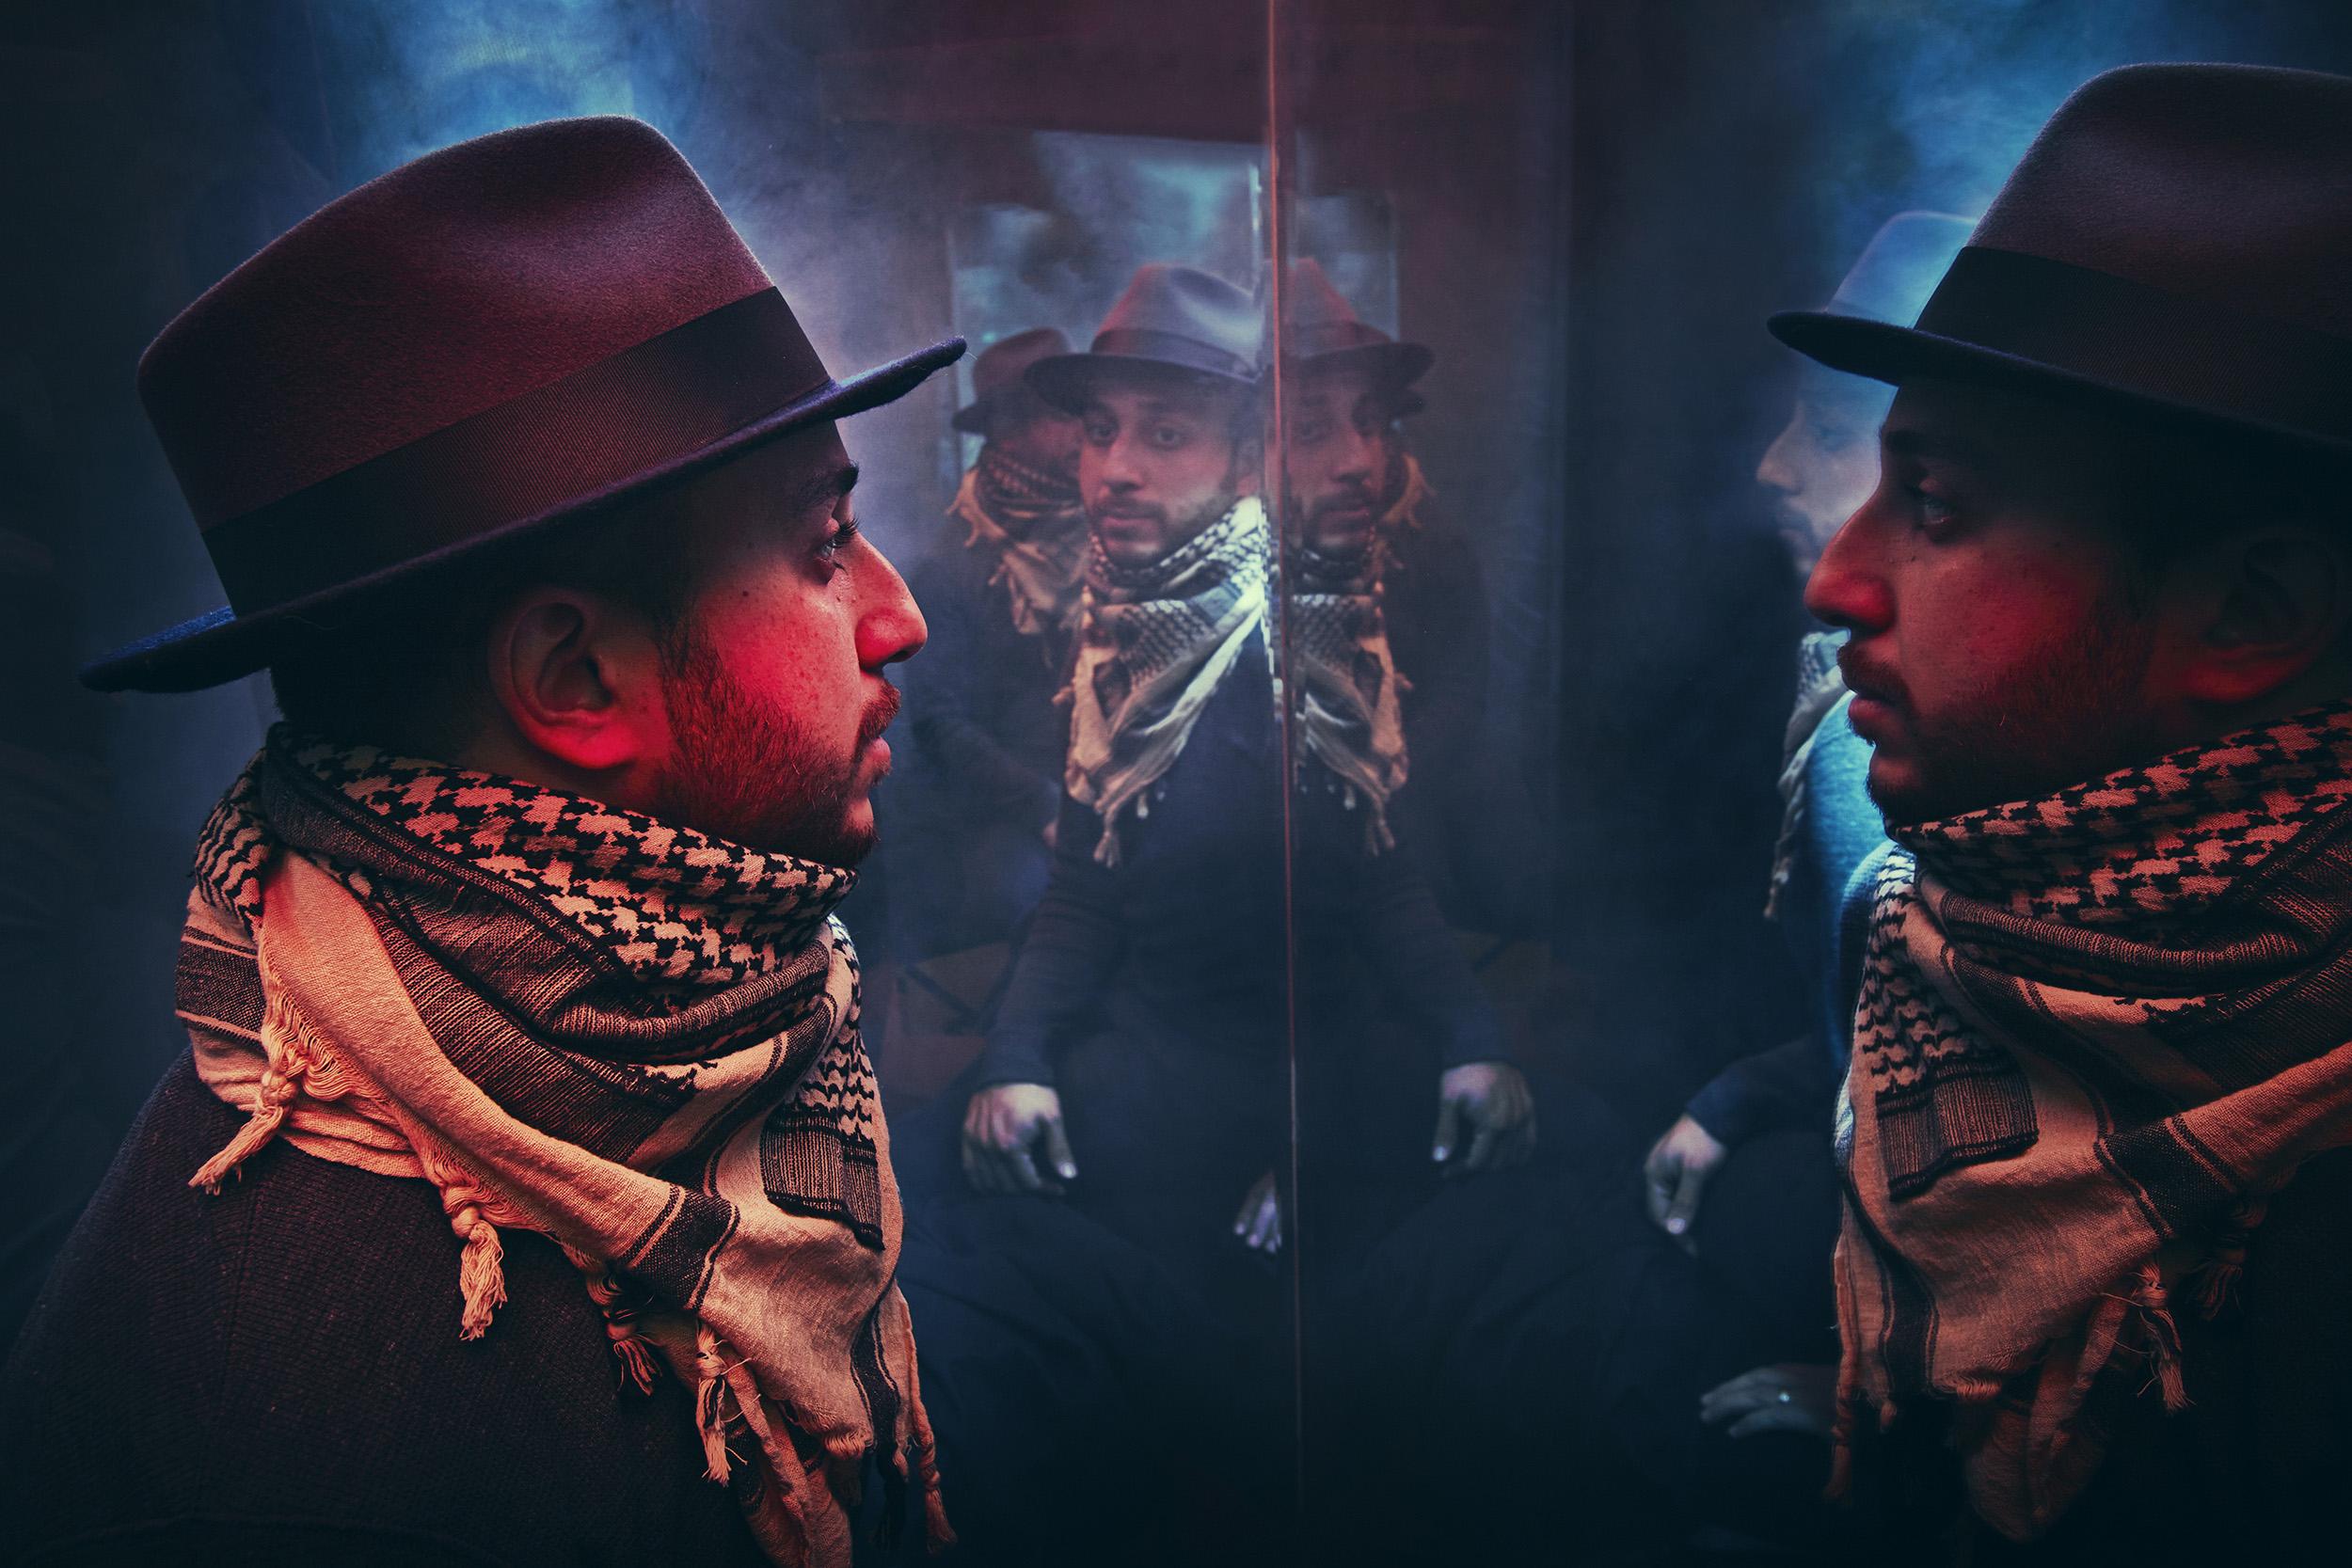 Bassel_AlbumCover_MirrorConcept_501-Exp2.jpg